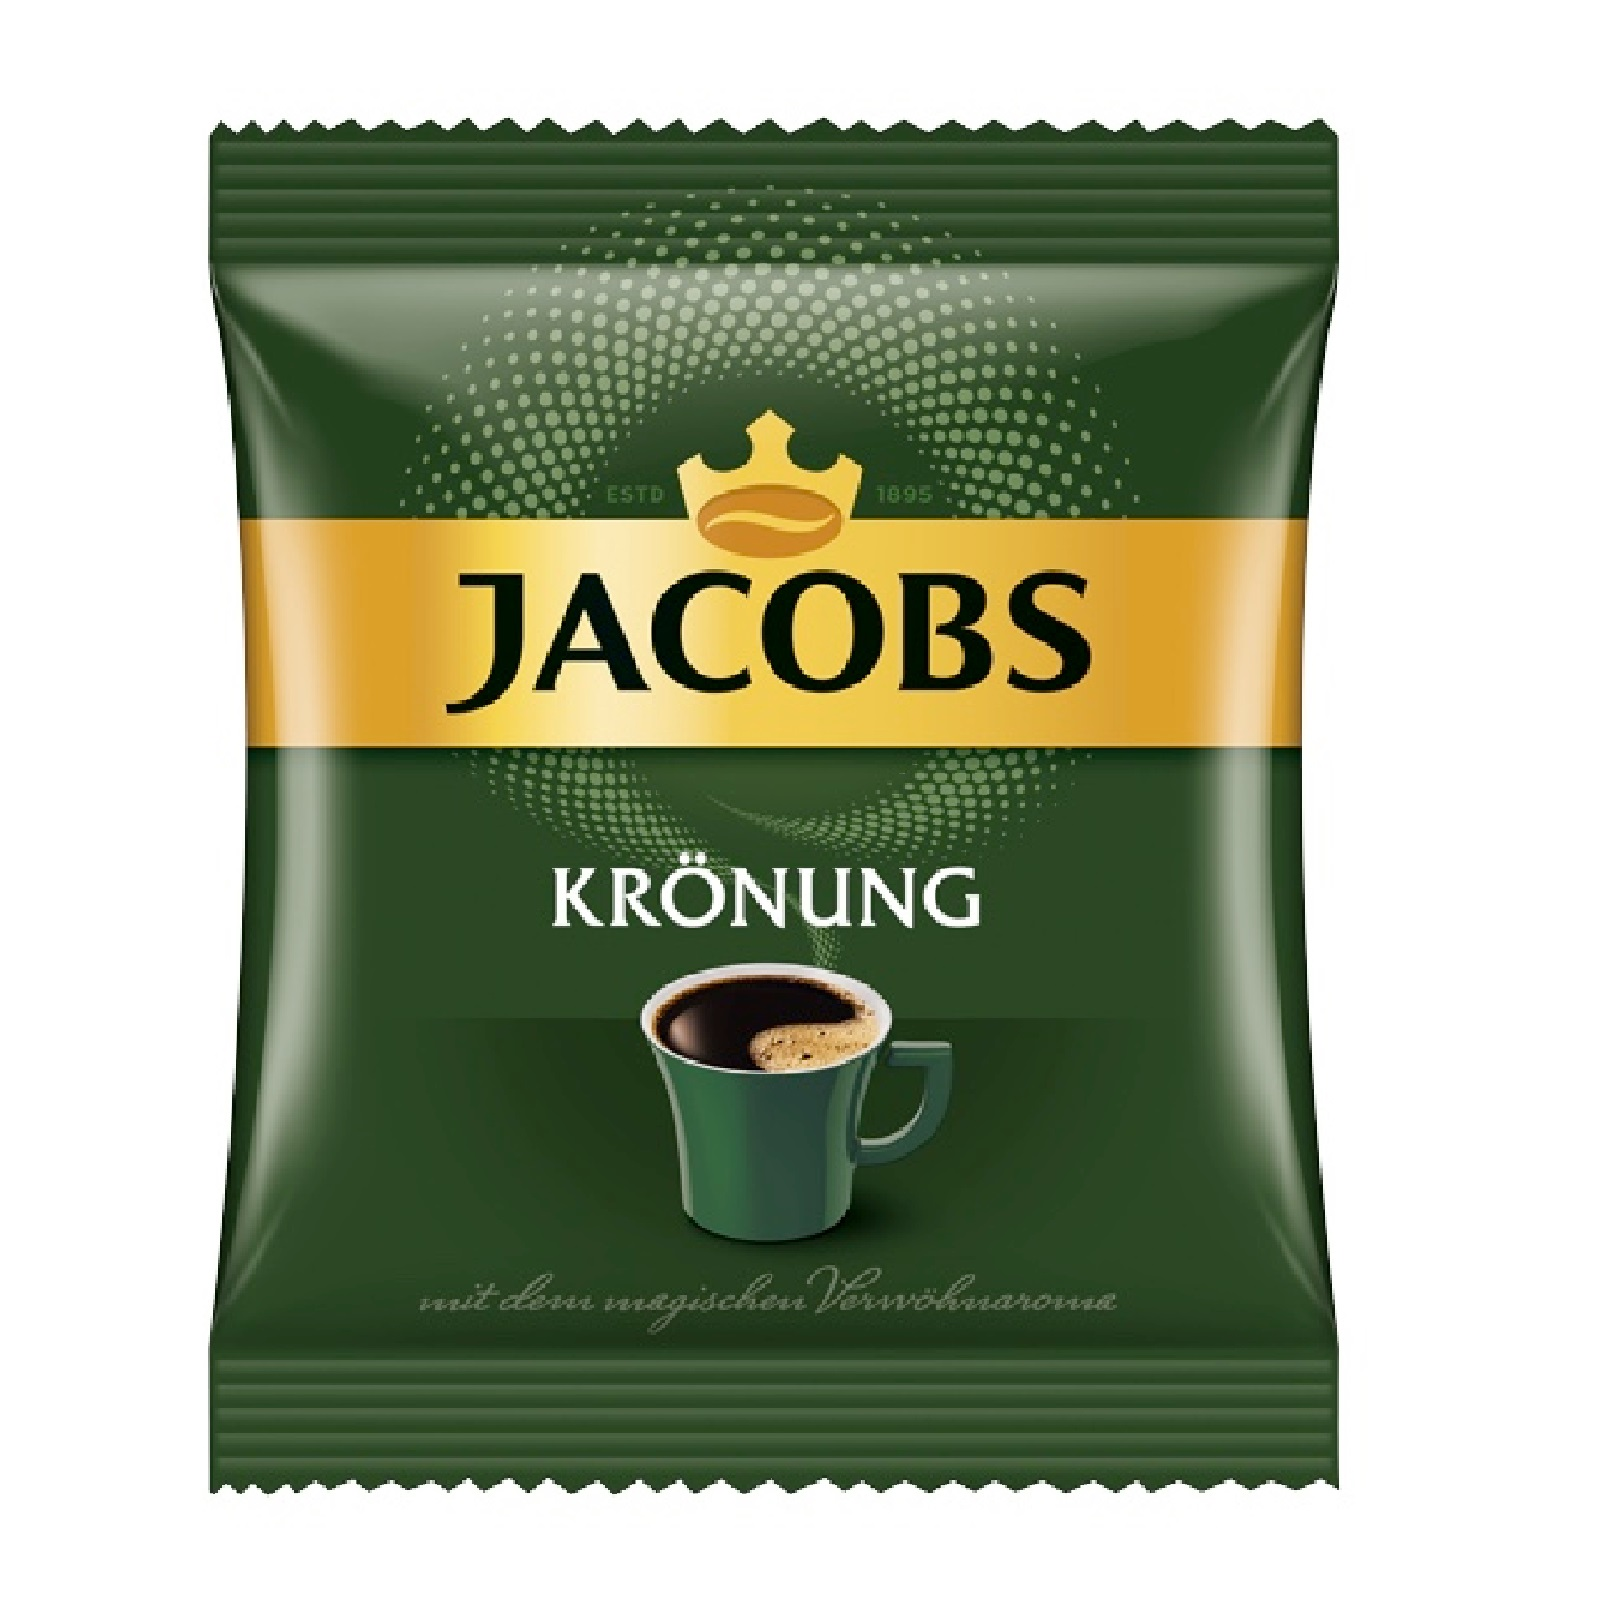 Jacobs Krönung 80 x 60g Röstkaffee gemahlen